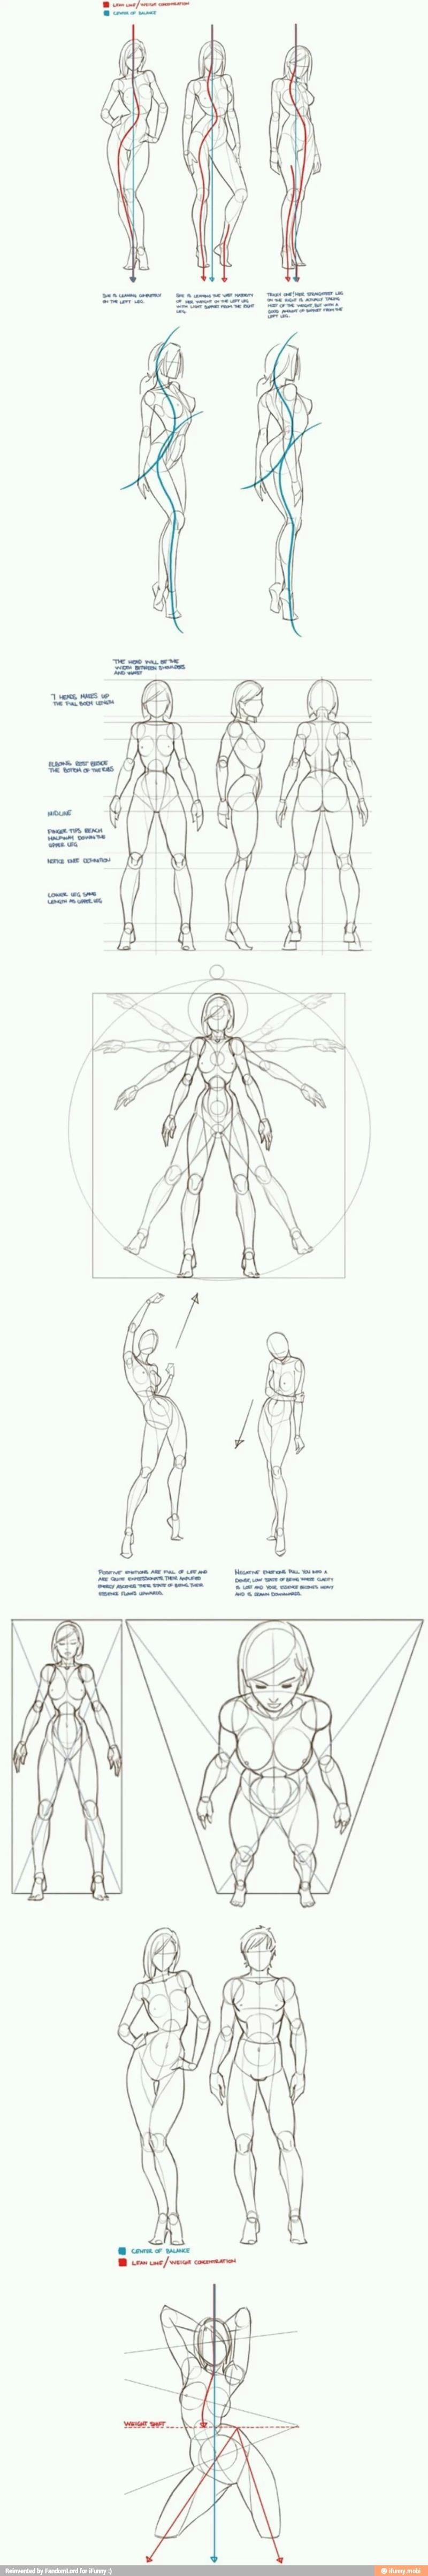 416b771f45e59197d1472913bd876ee2.jpg (800×4818) | Sketches ...